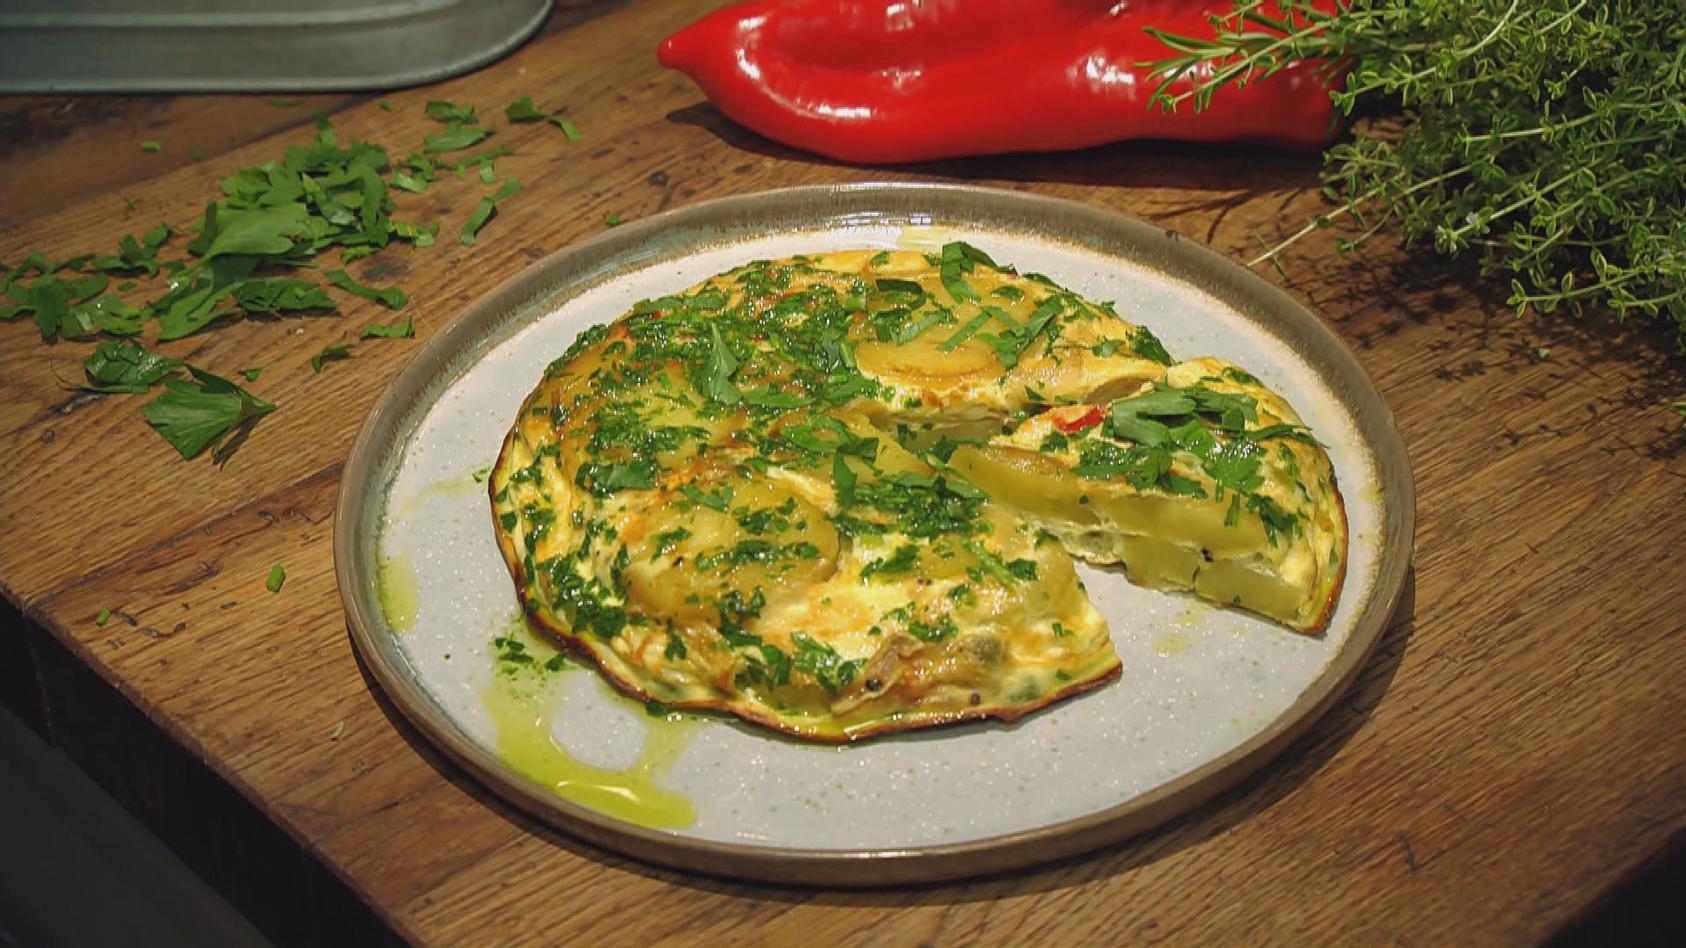 Frische Gartenküche – Purer Genuss aus der Heimat: Gemüse-Tortilla